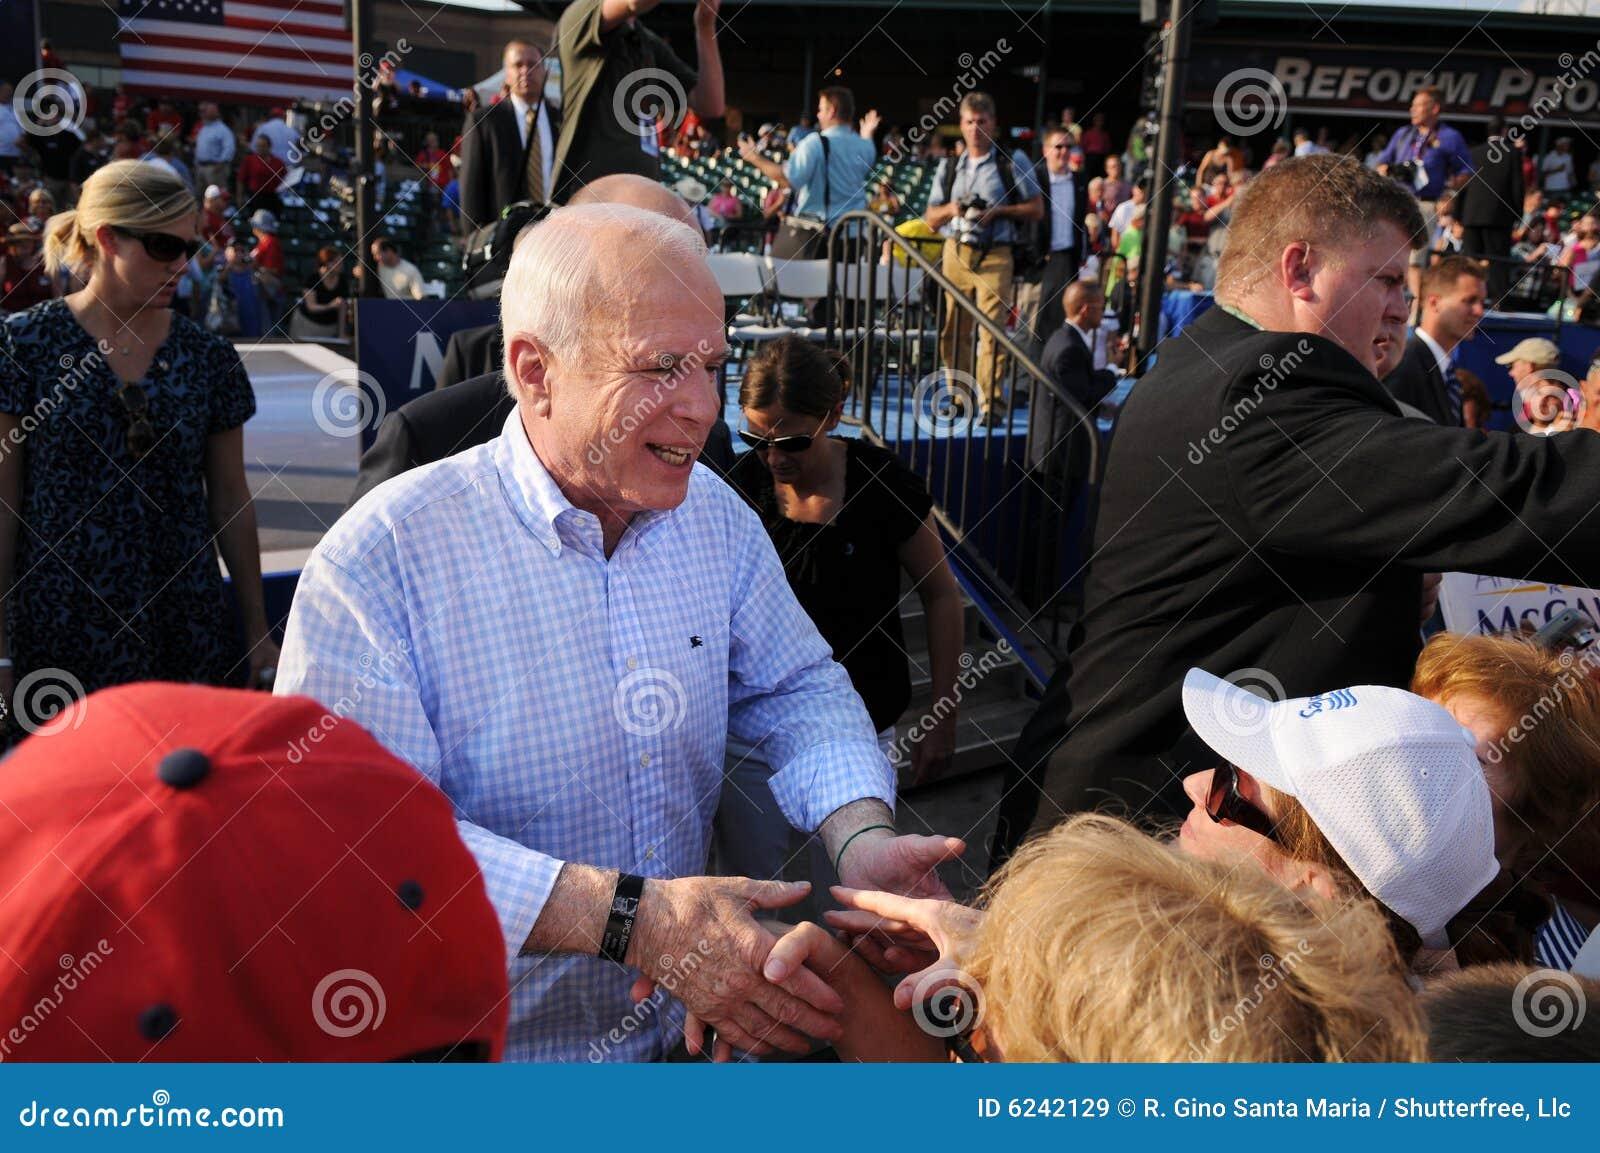 John McCain Shakes Hands